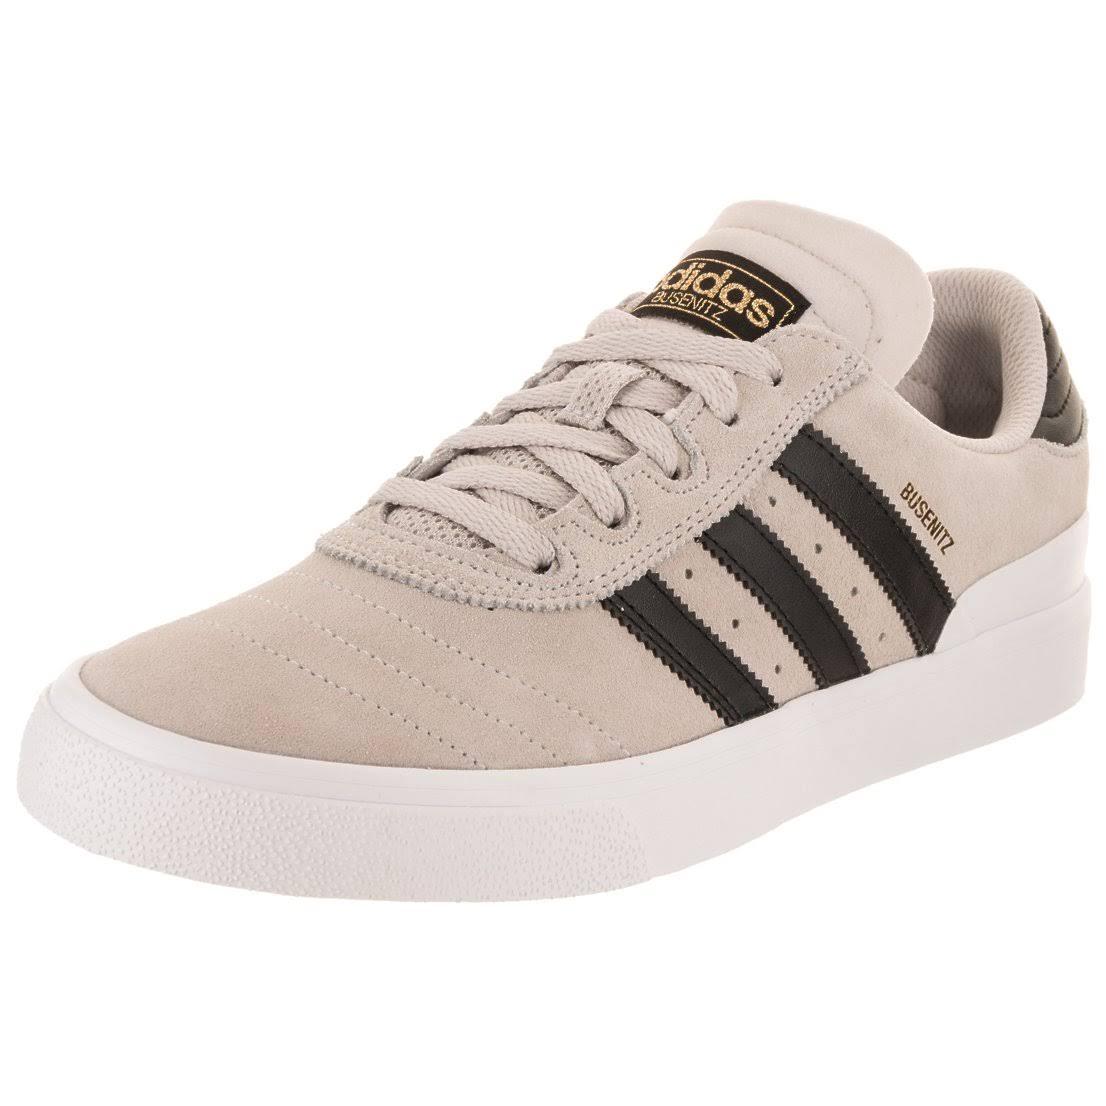 Busenitz Herren 12 Vulc Wolke Adidas Weiß 5 Schuhe UdvAwnxq